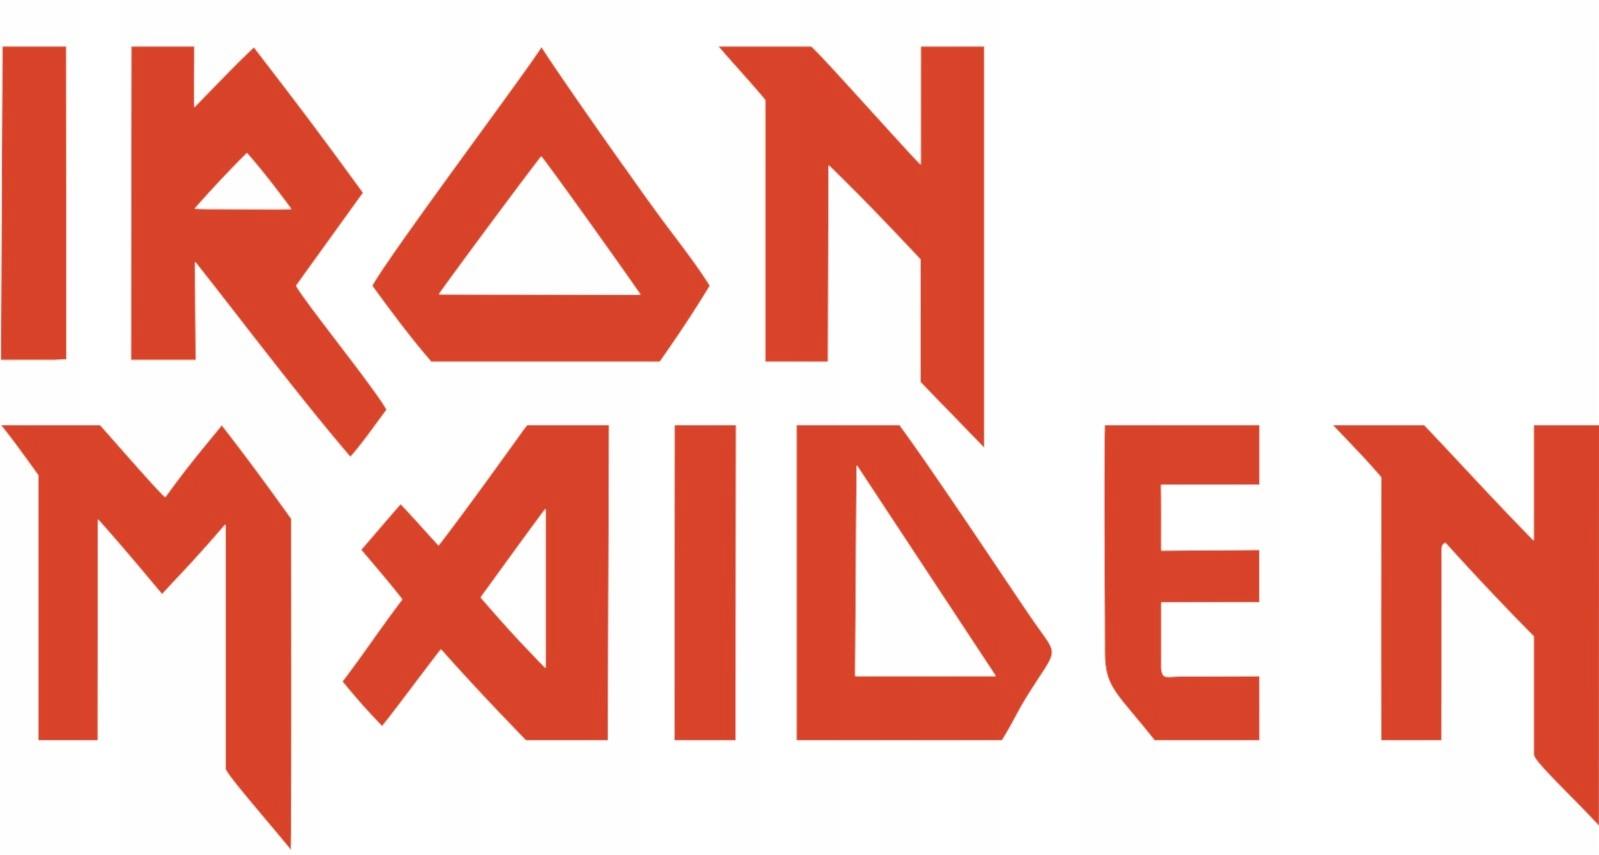 Item Iron Maiden sticker 16 cm x 8 cm film 3M 1080